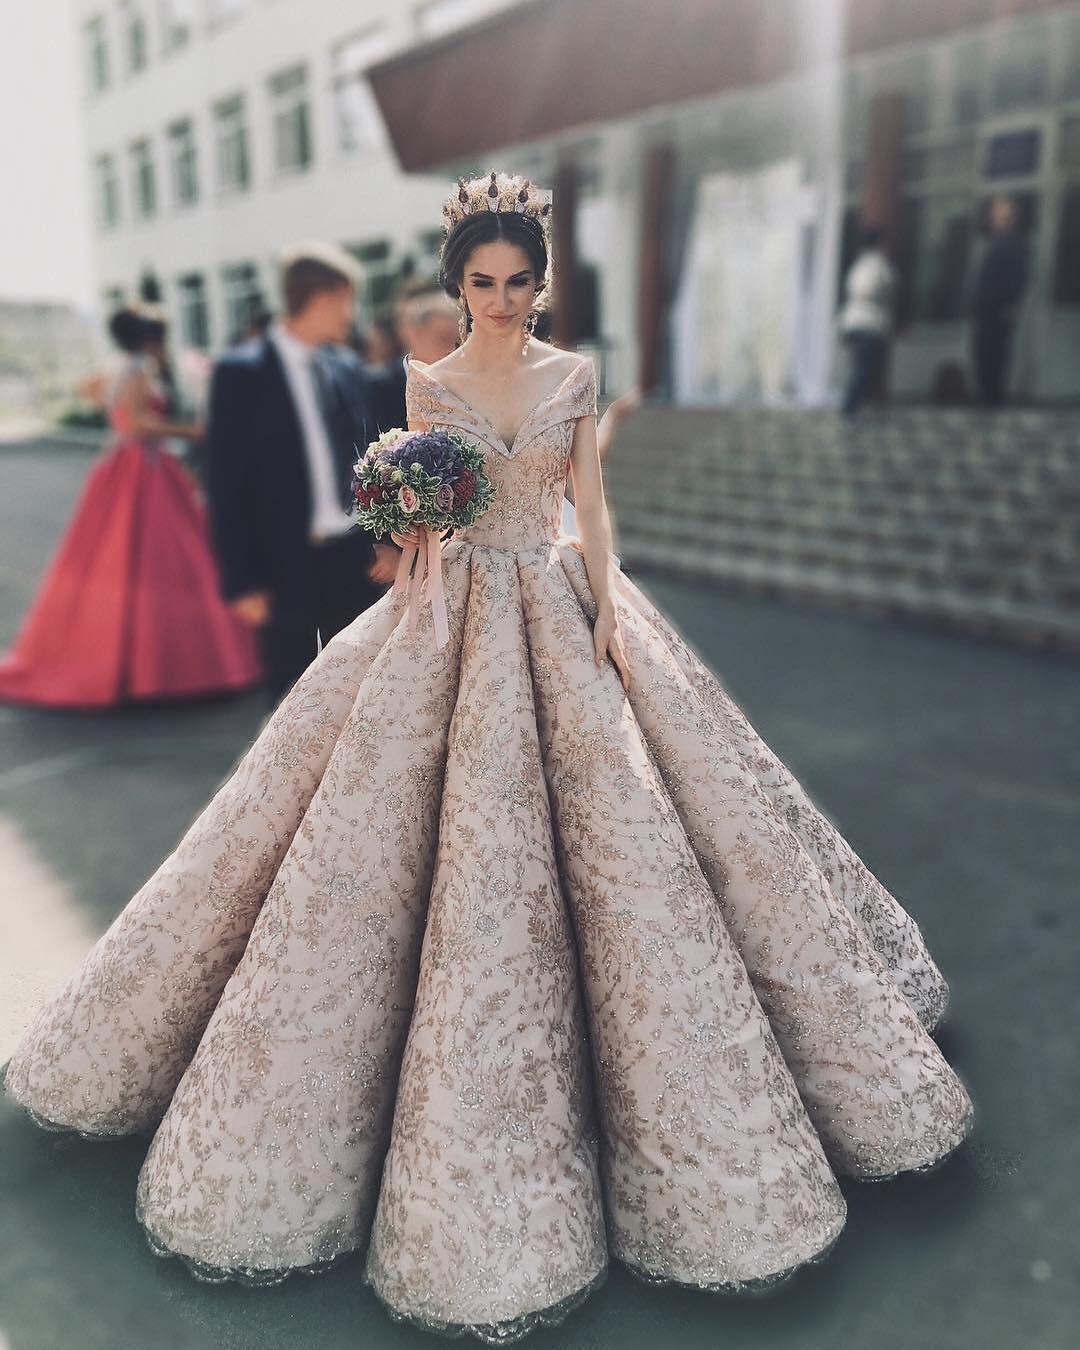 Rreth Femrave Follow Rreth Femrave Make Fashion Beauty Lips Hair Hairstyle Ha Ball Gowns Wedding Dresses Princess Wedding Dresses